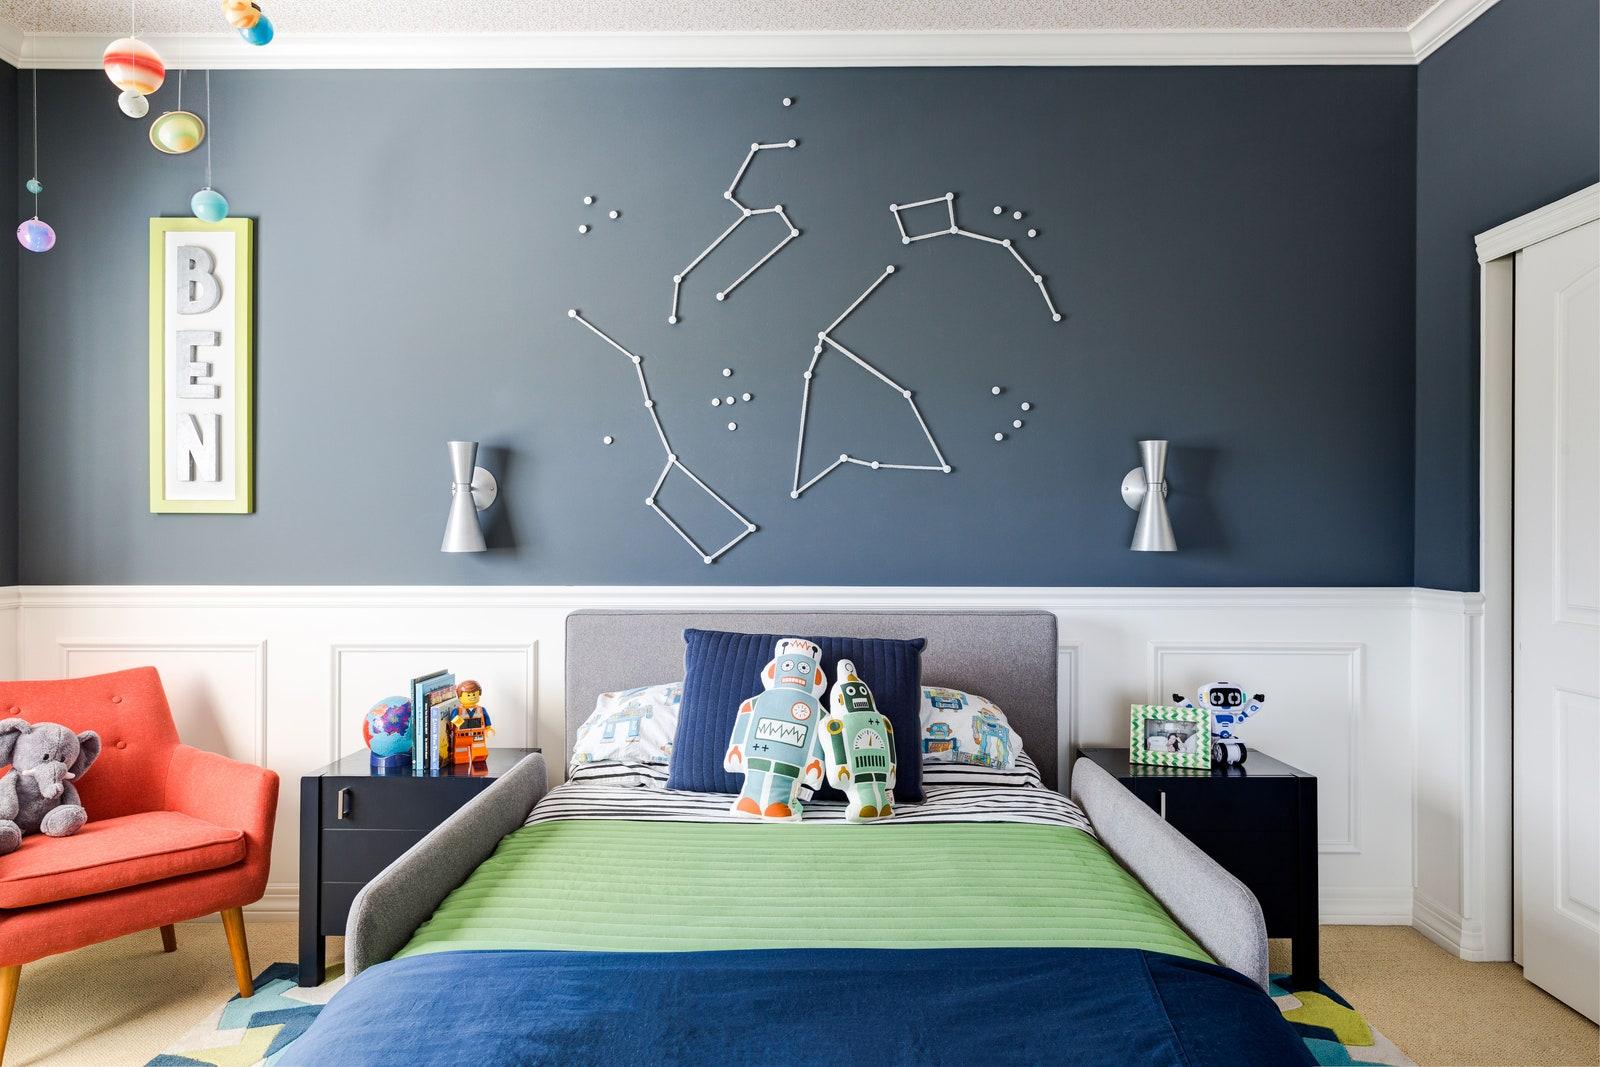 Ideia Decorar 21 ideias para decorar paredes 21 ideias para decorar paredes 20